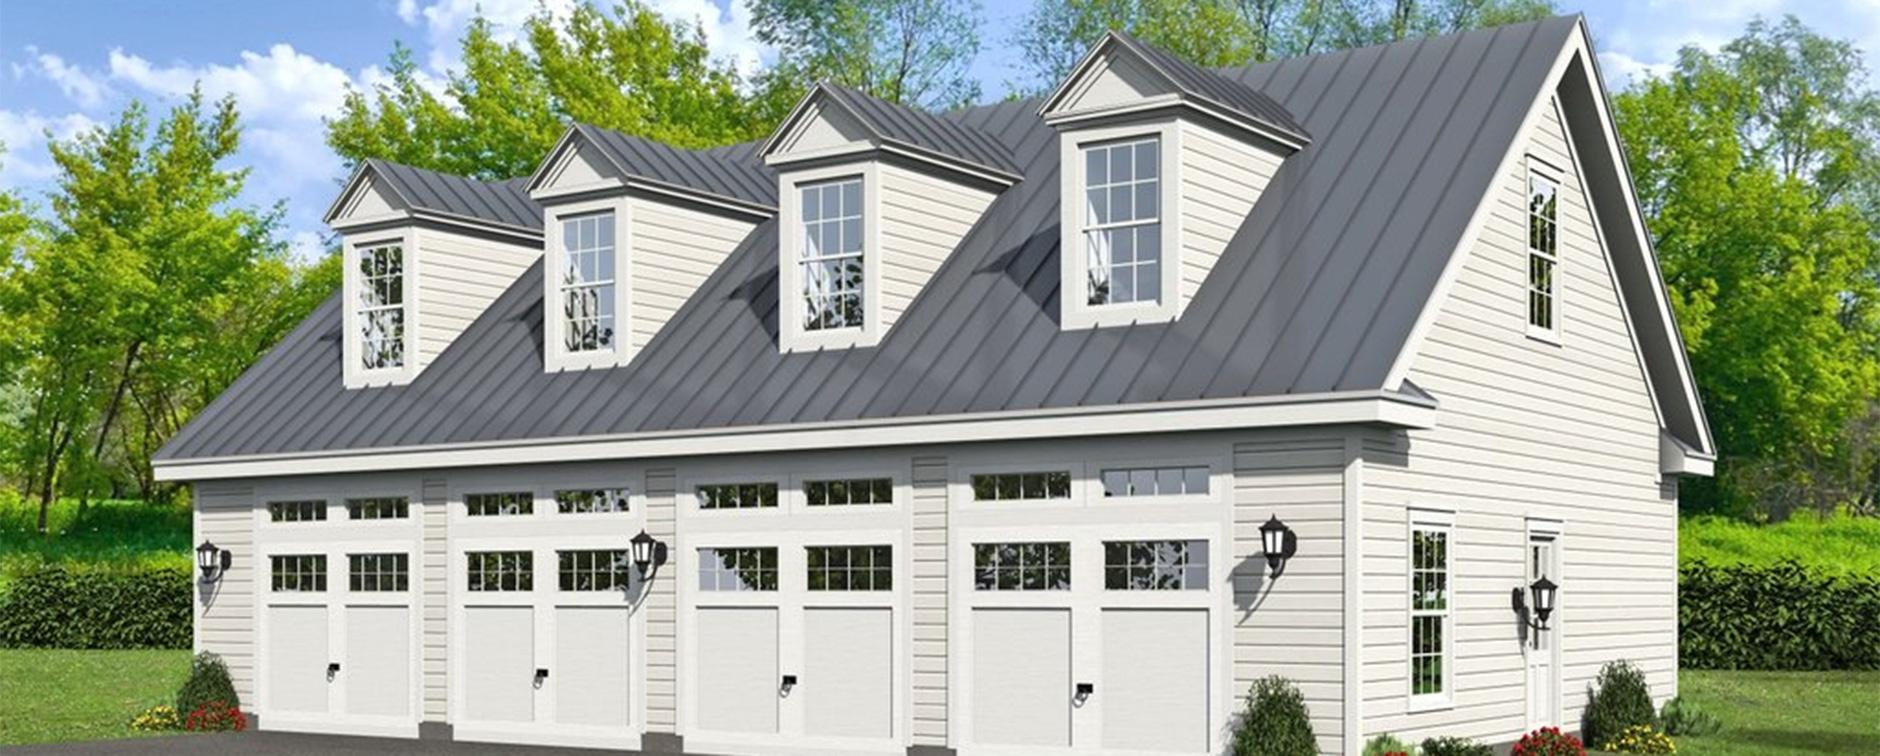 Take a Look at Garage Plans